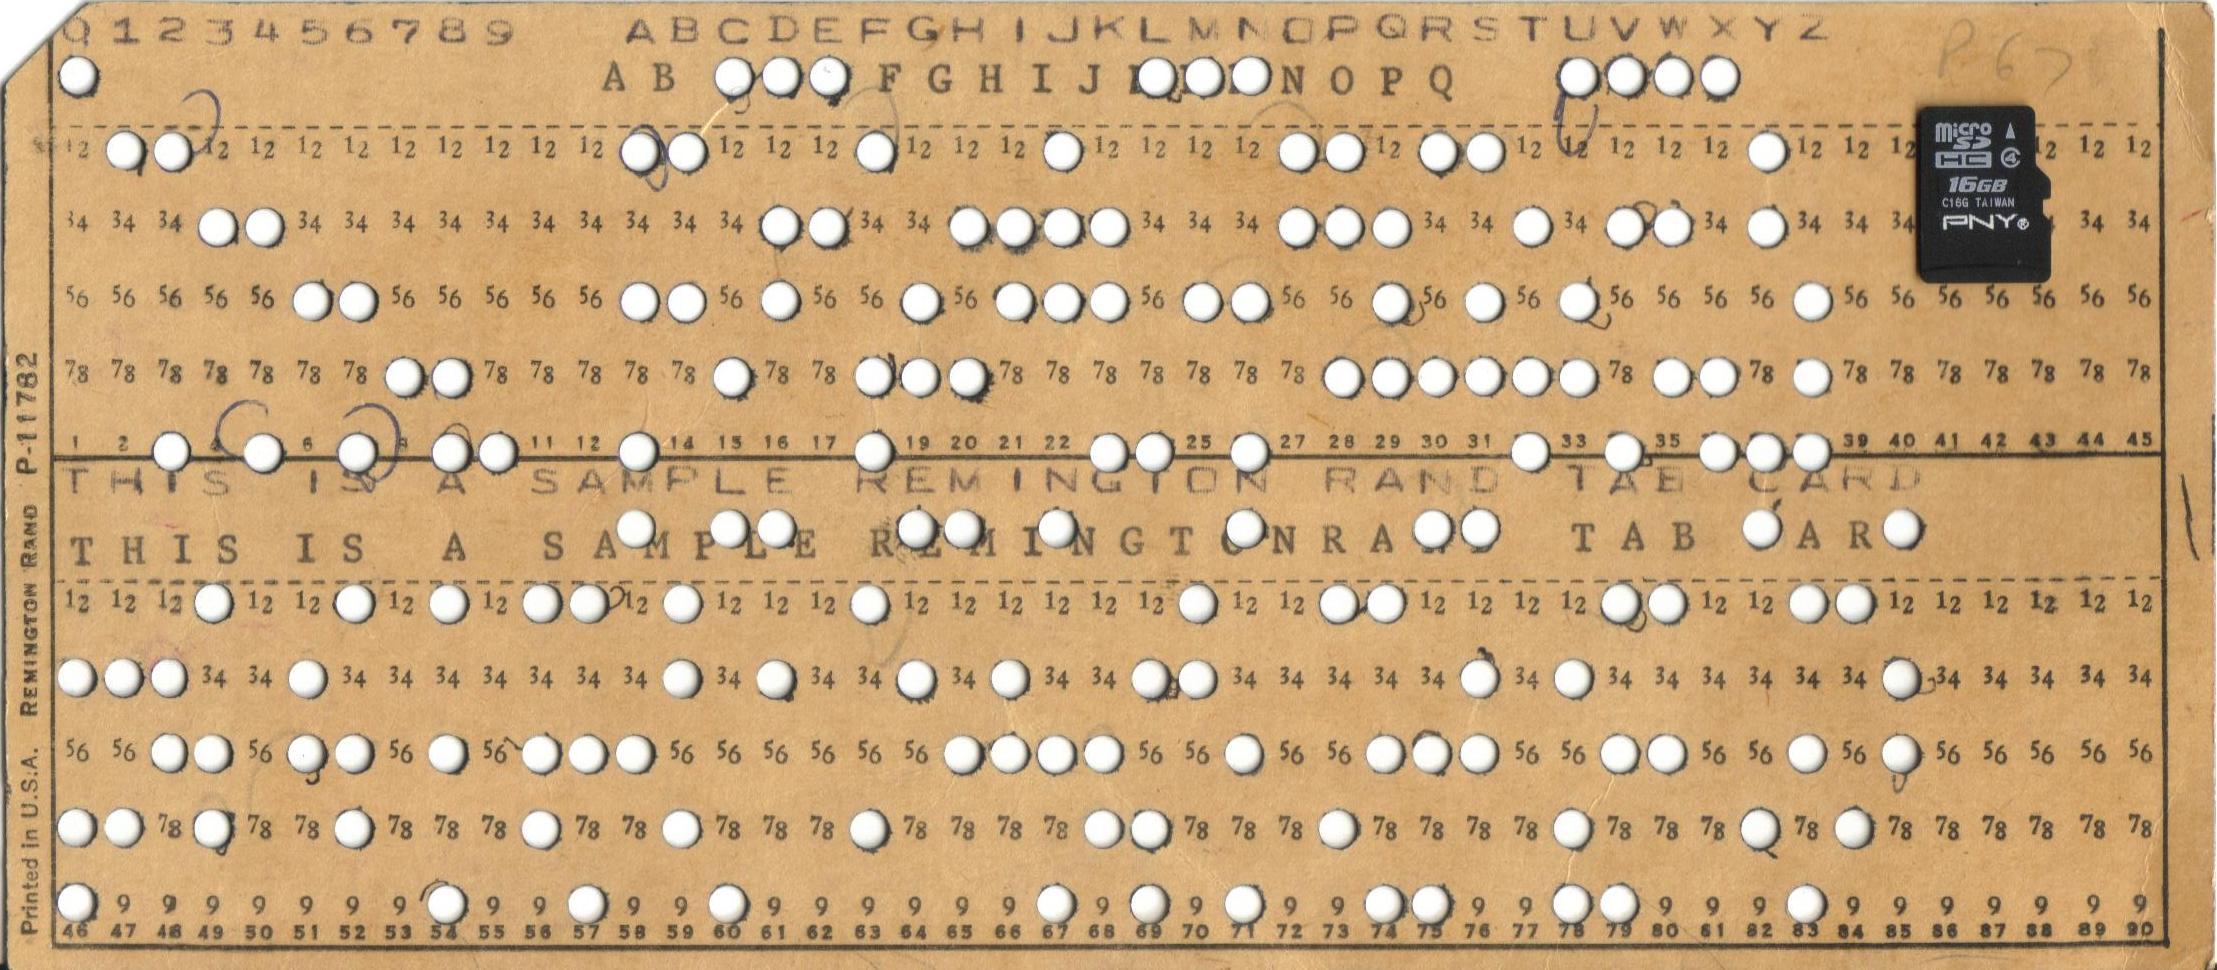 Original IBM Punch Card